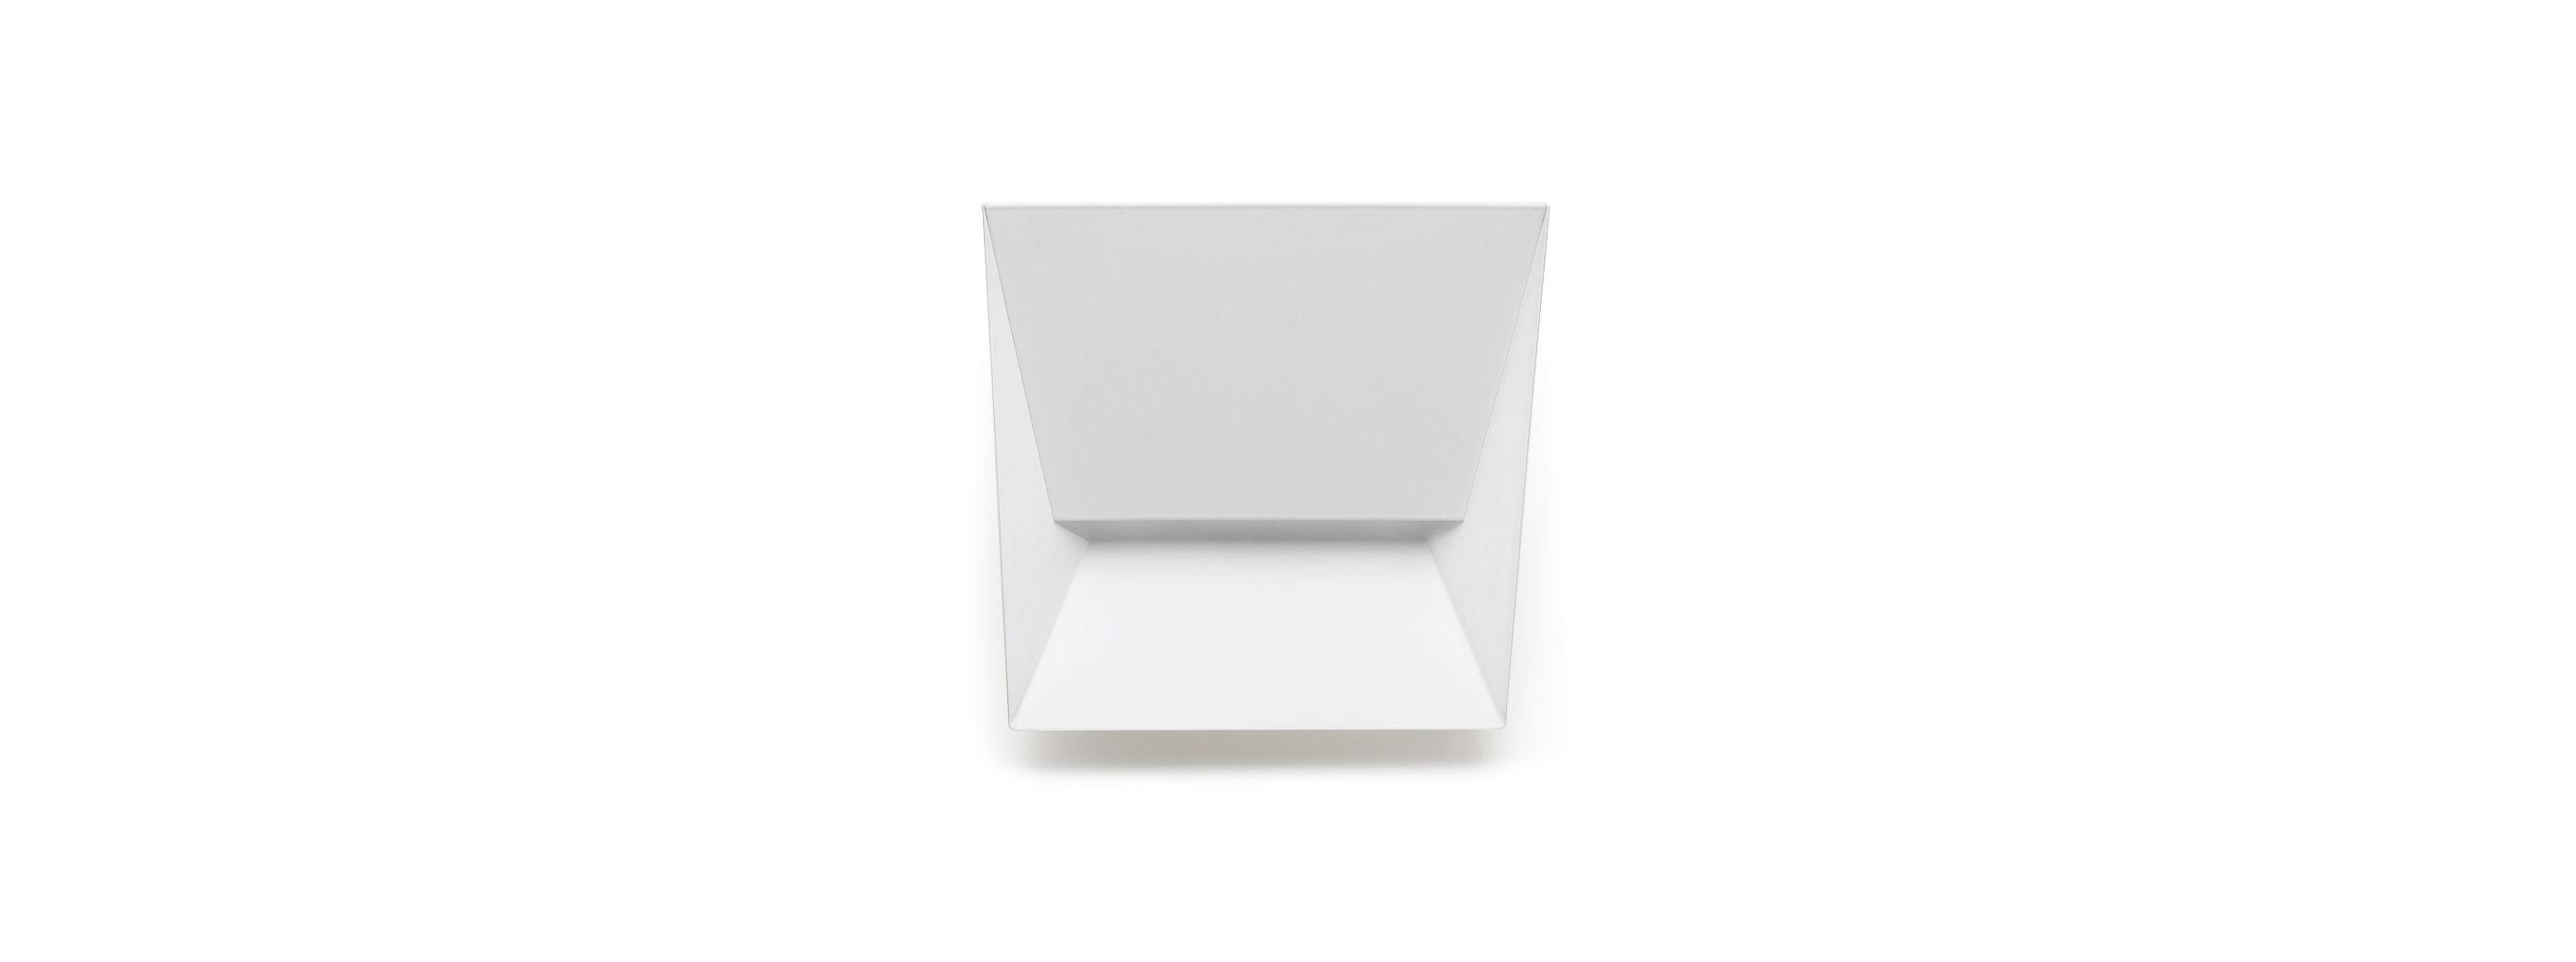 Lighting - Wall Lights - Mail S Wall light by Lumen Center Italia - S / L 19 cm - Matt white - Lacquered metal